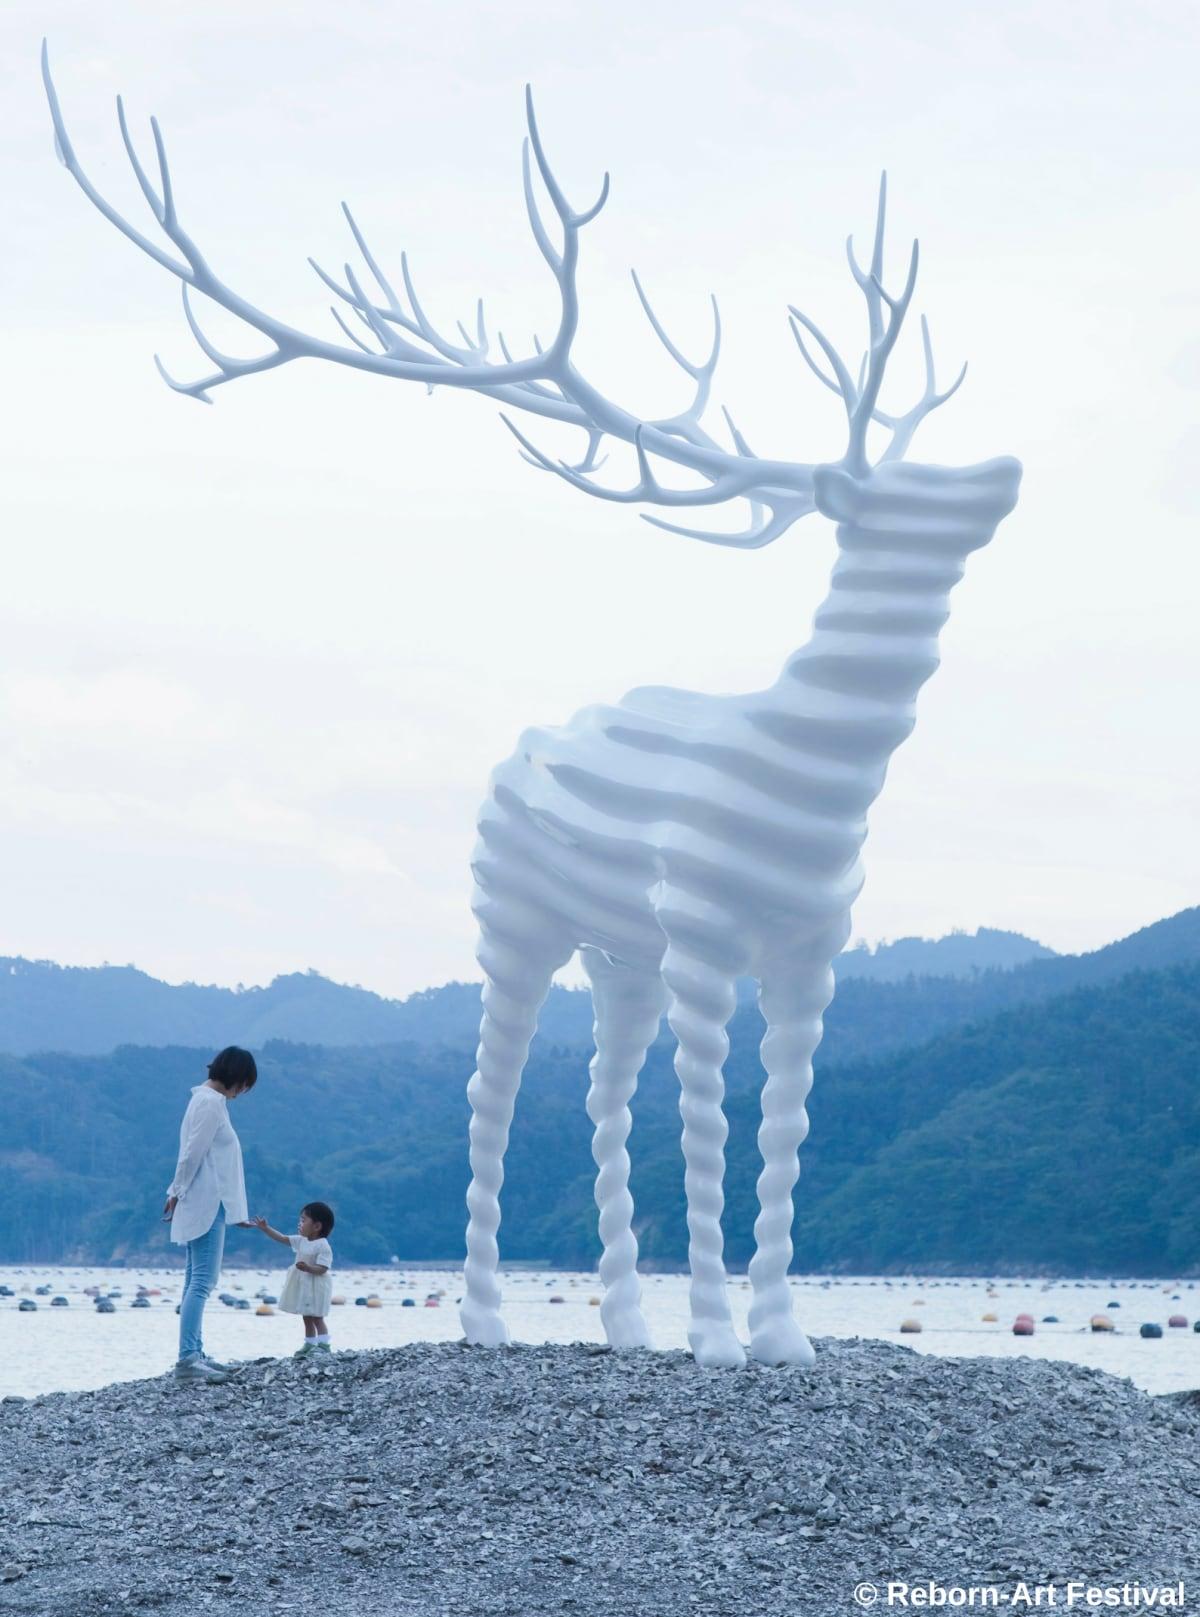 Reborn Art Festival (Miyagi Prefecture)